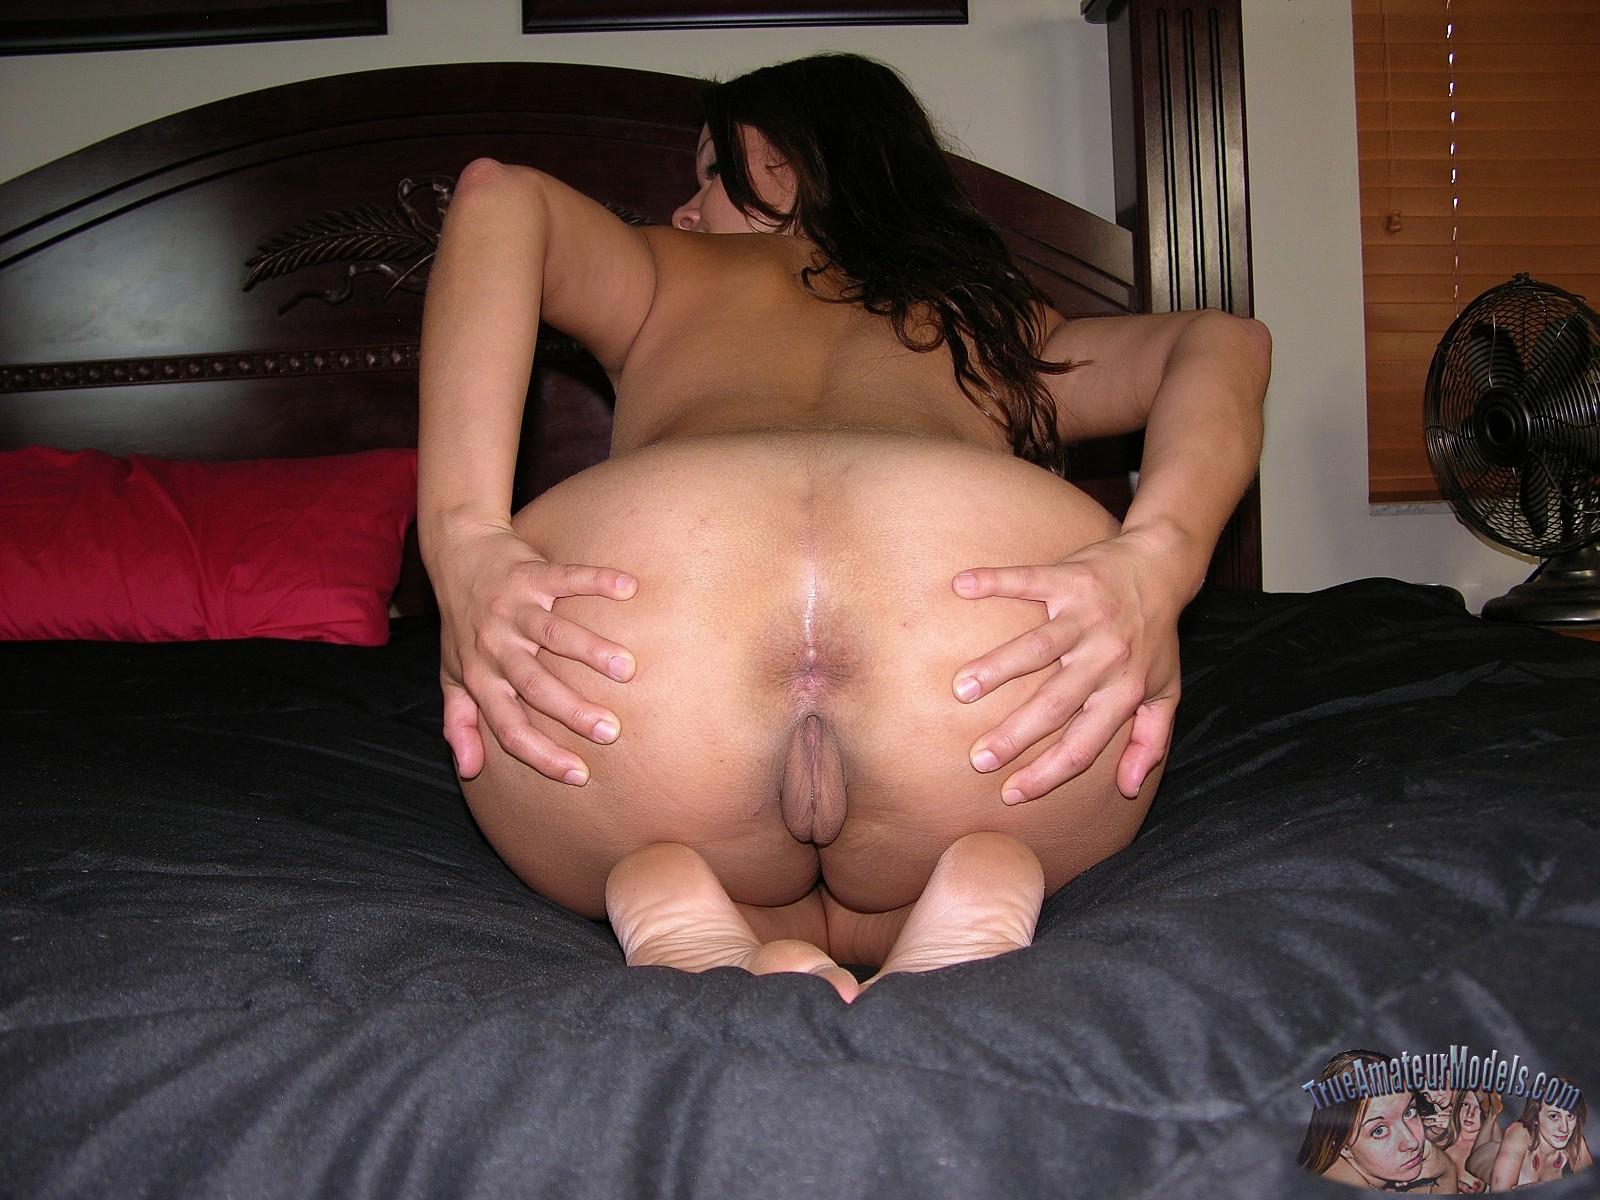 big-tits-babe-dulce-model6